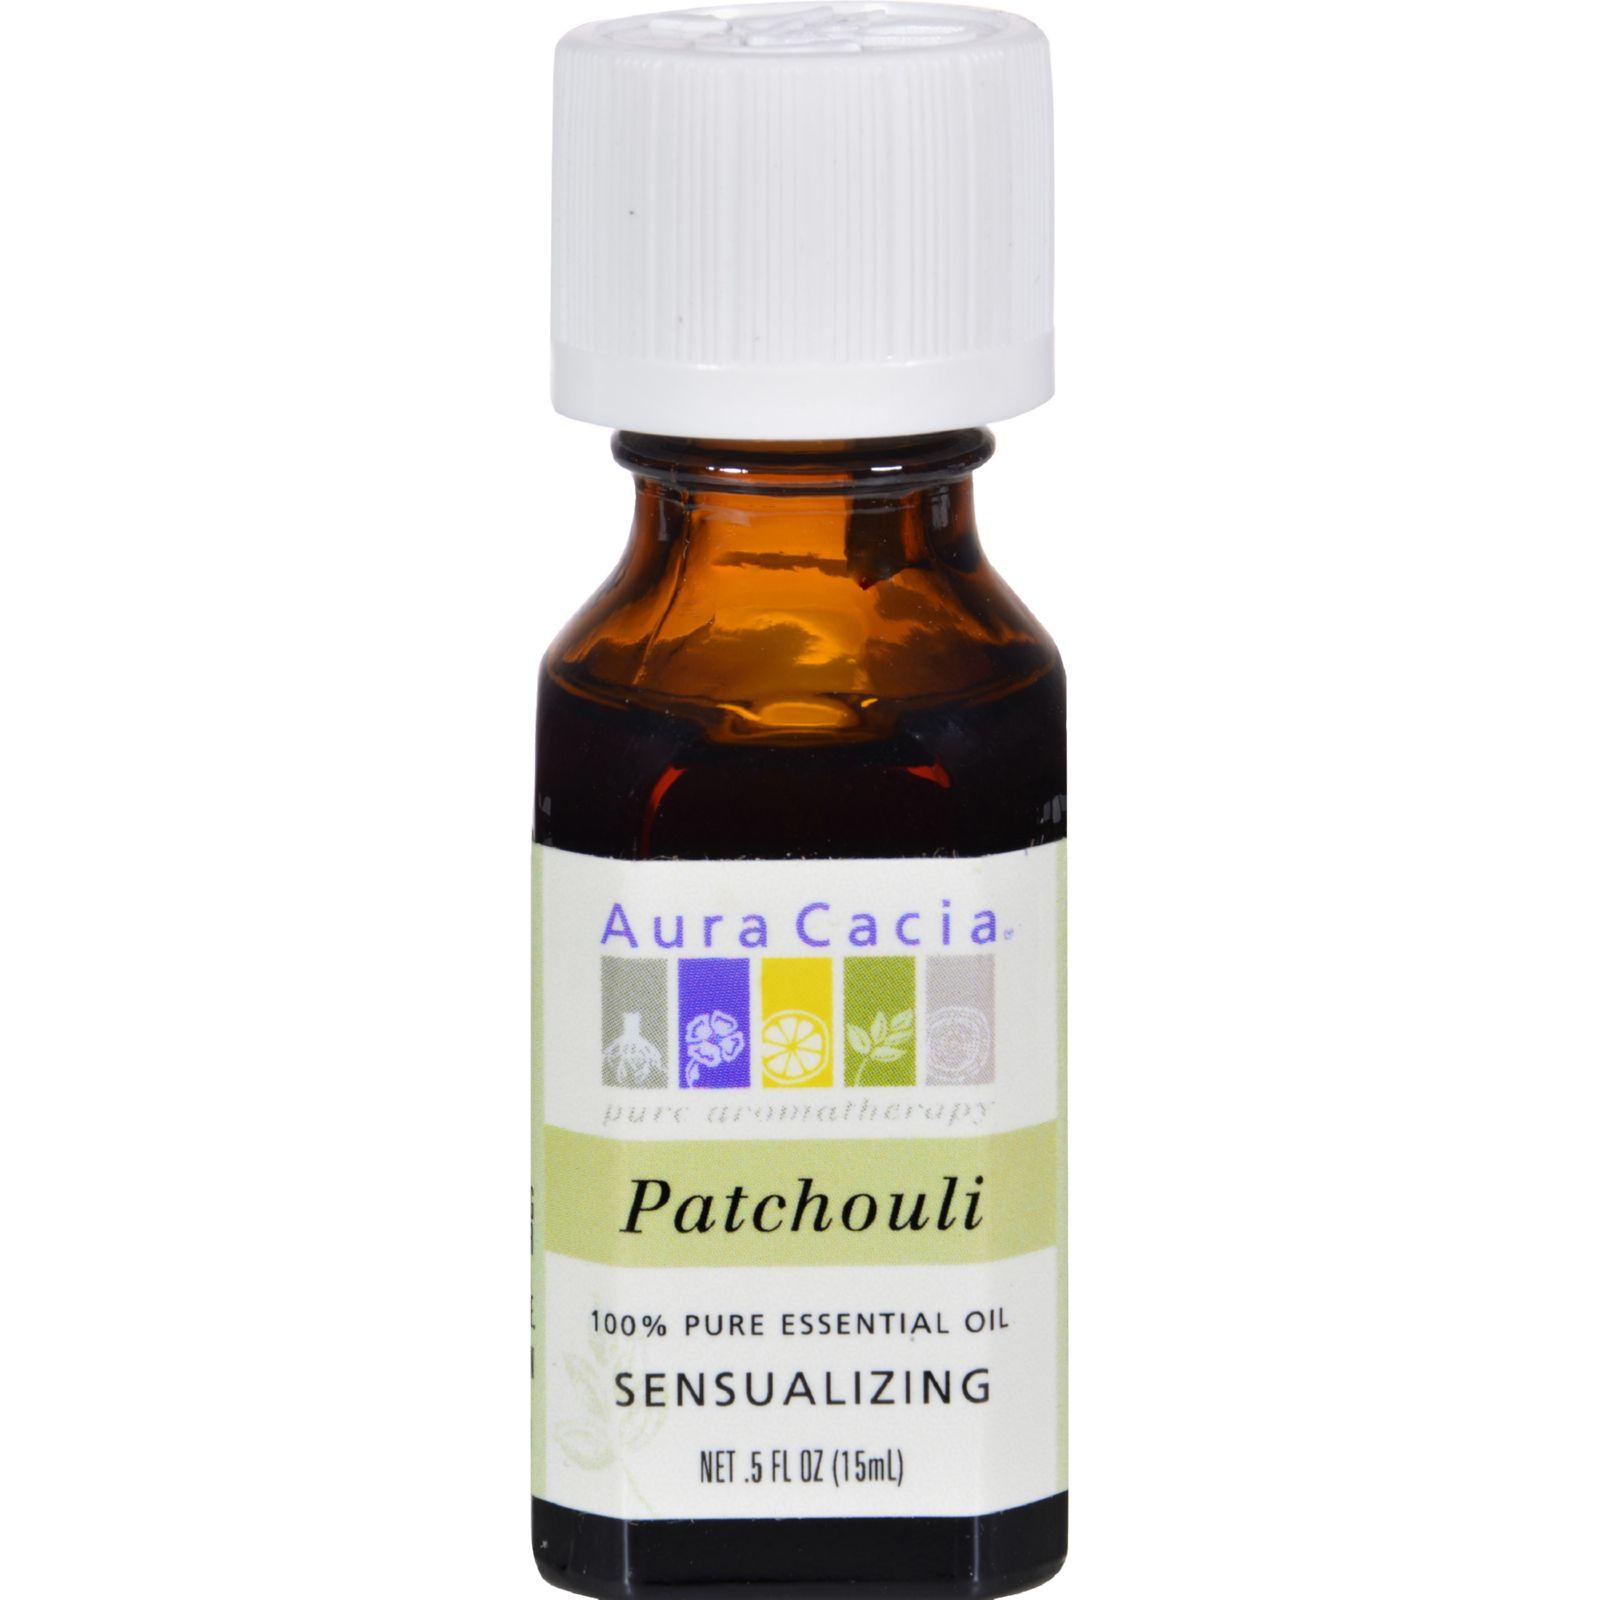 Aura Cacia Essential Oil Patchouli .5 oz Oil